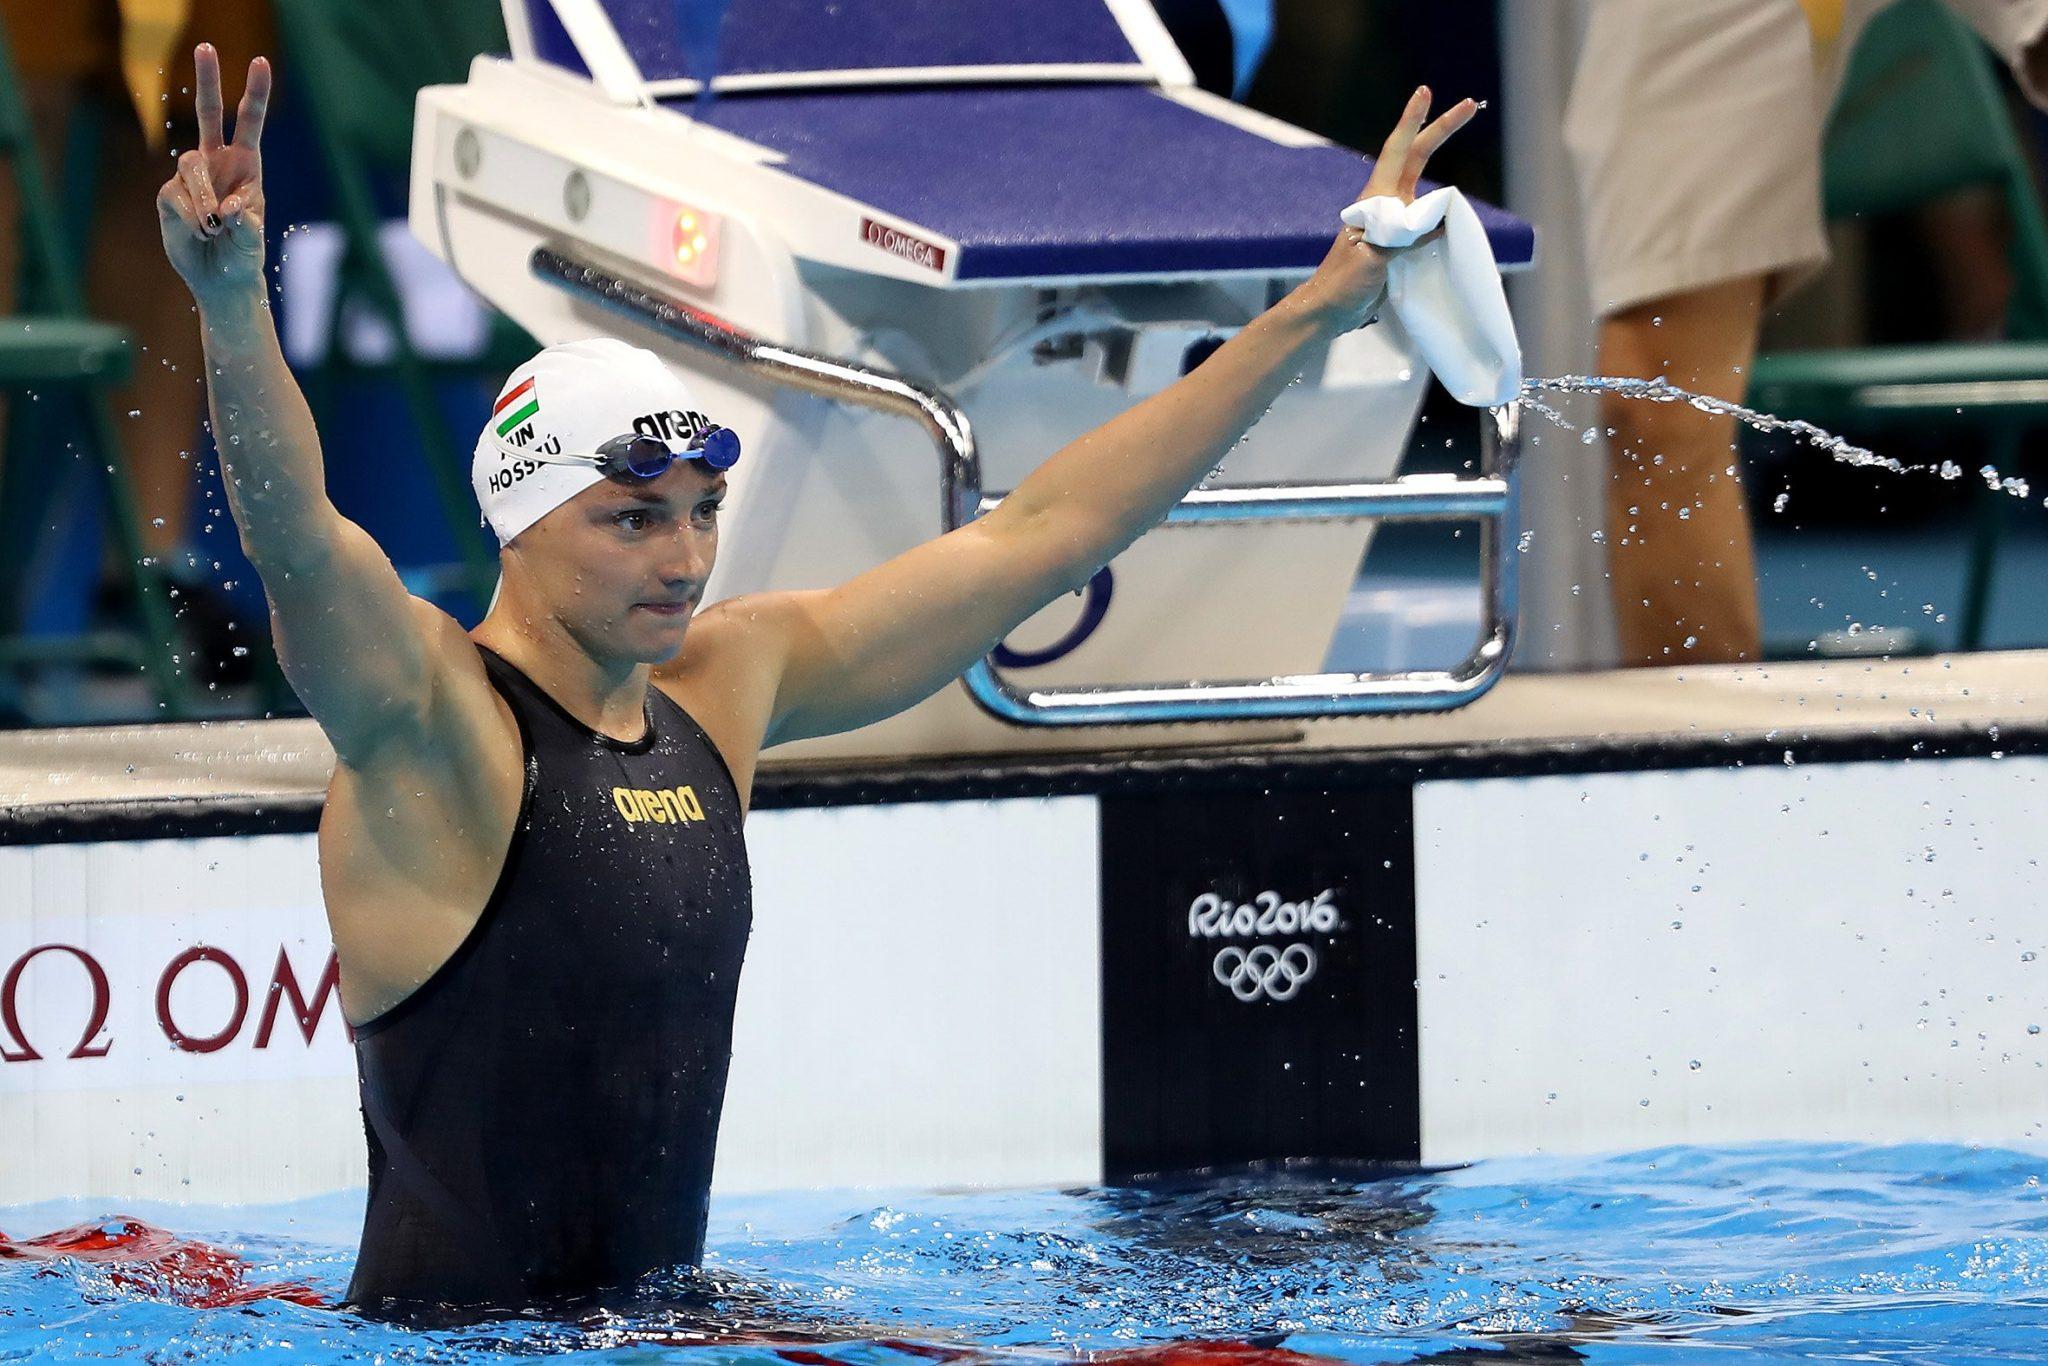 How was the World Aquatics Championship 2017 20